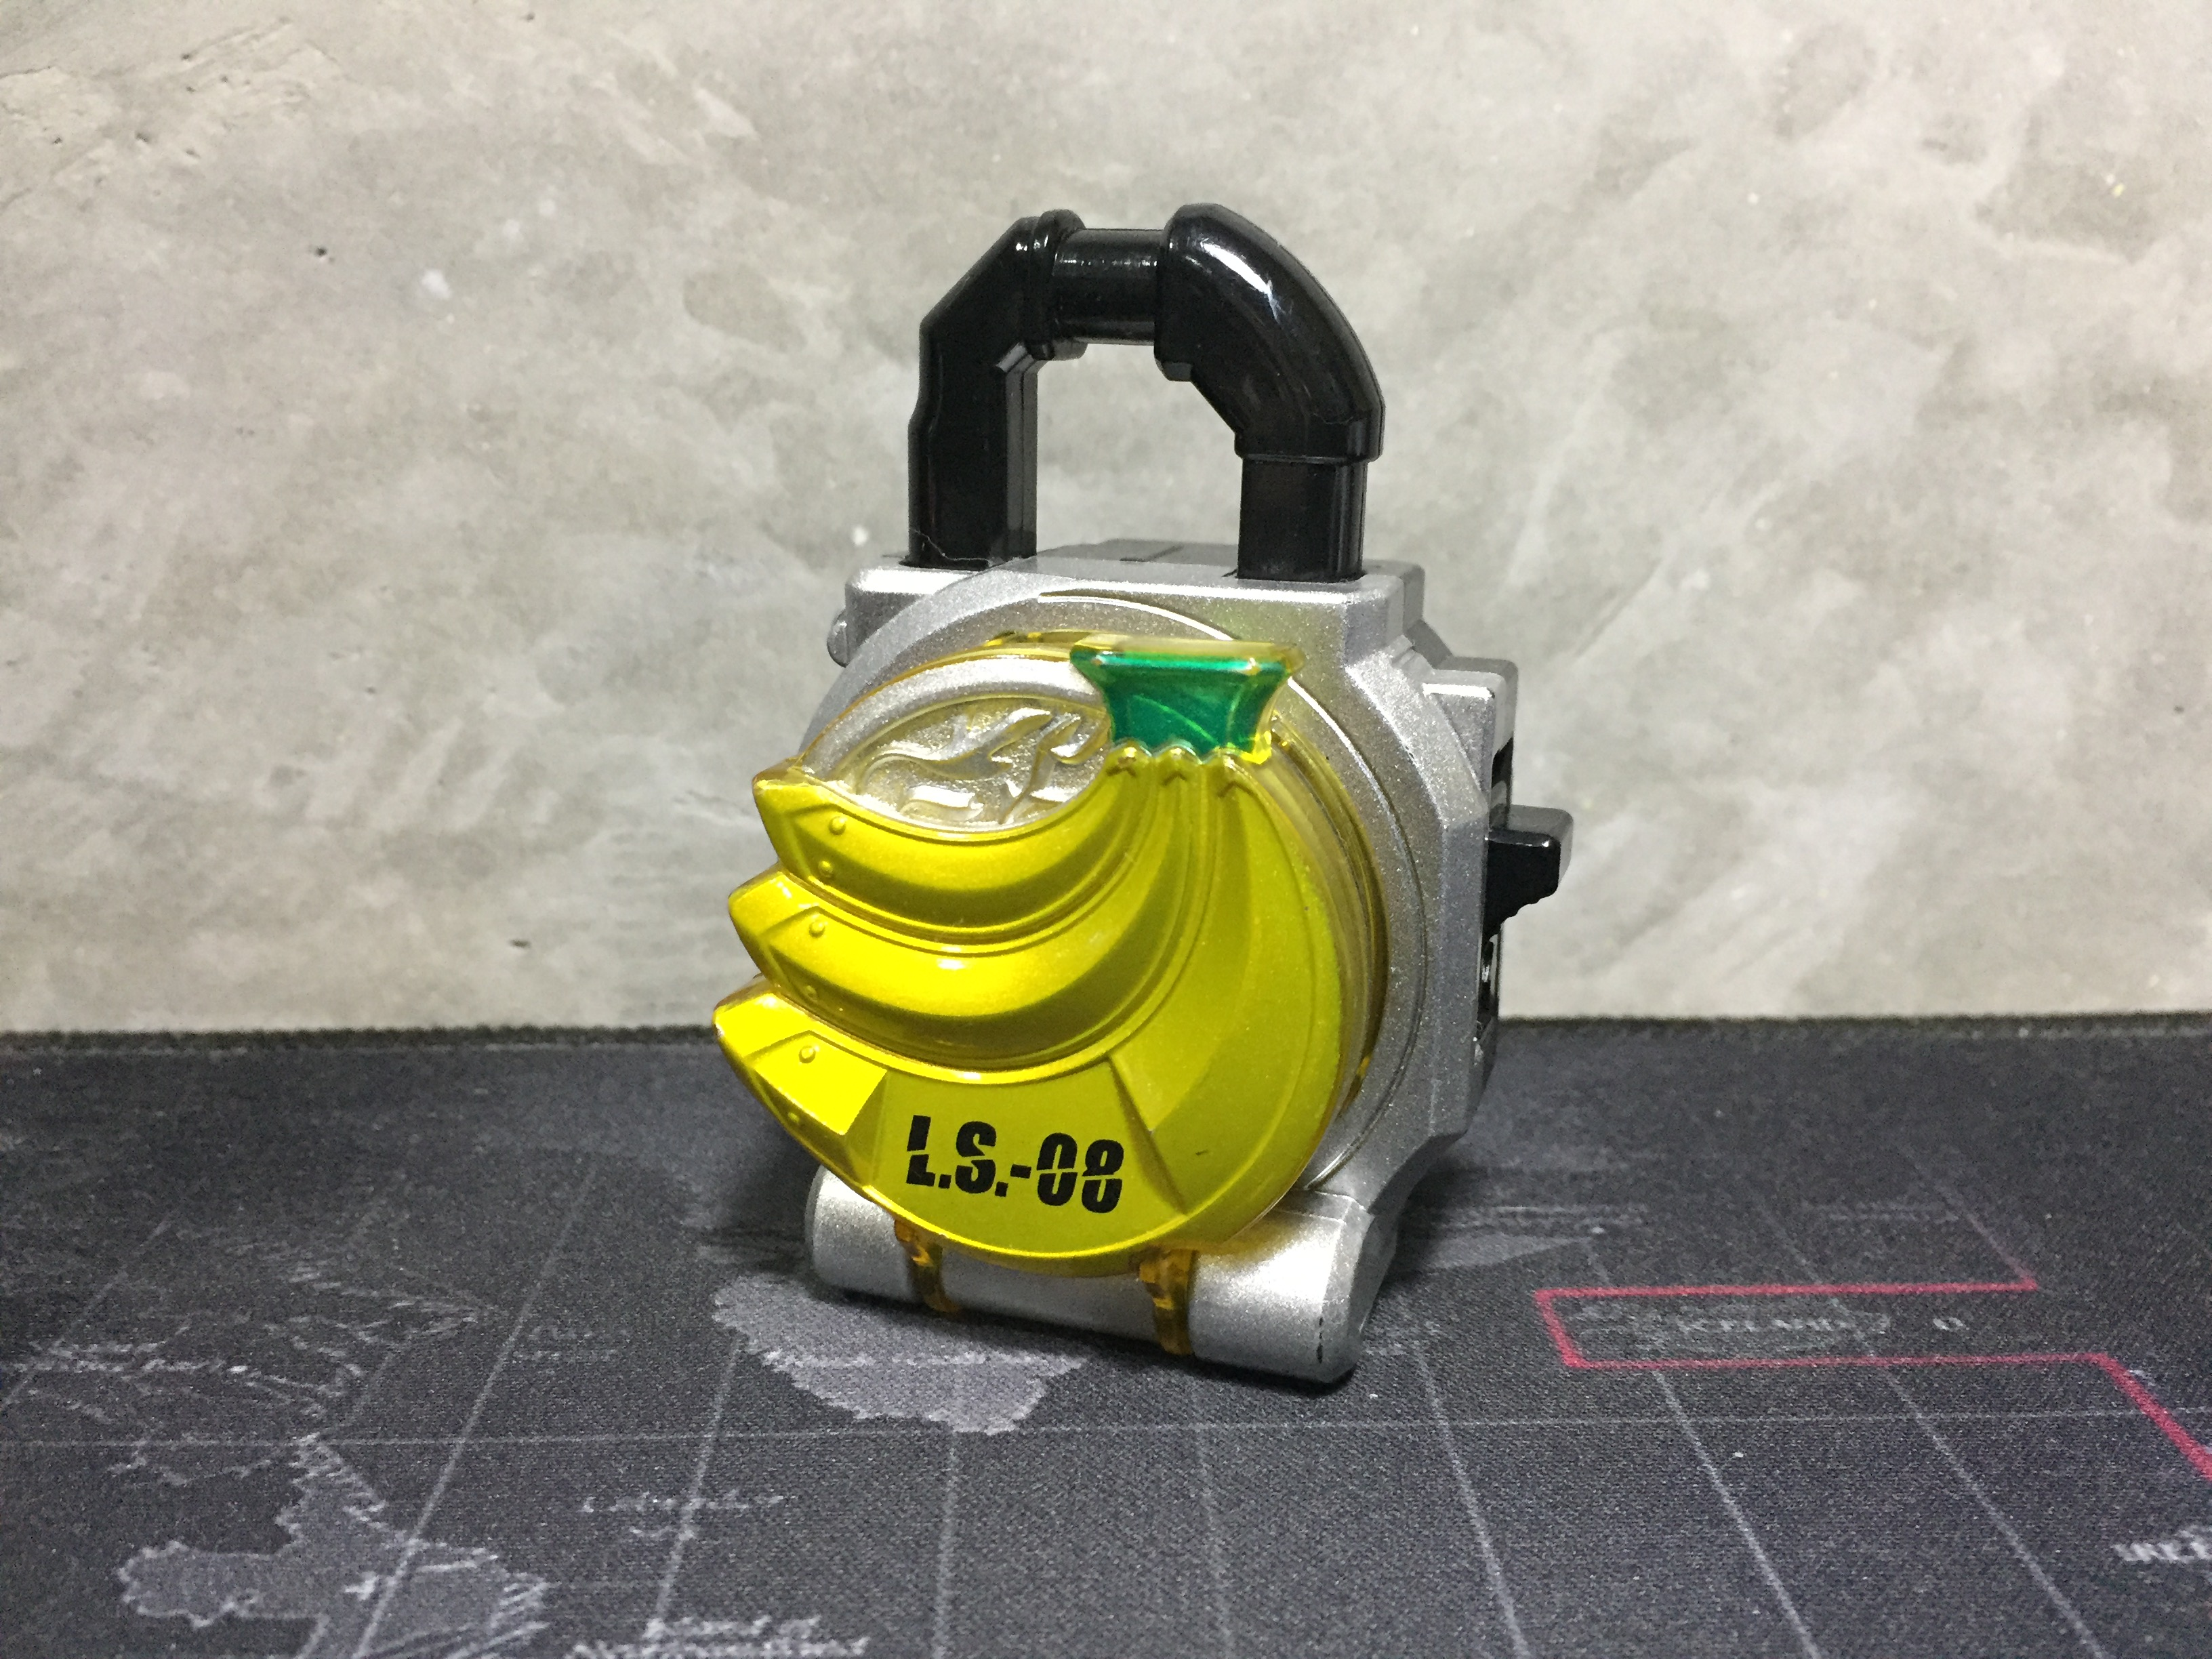 Kamen Rider Gaim DX L.S.-08 Banana Lock Seed (กล้วย)